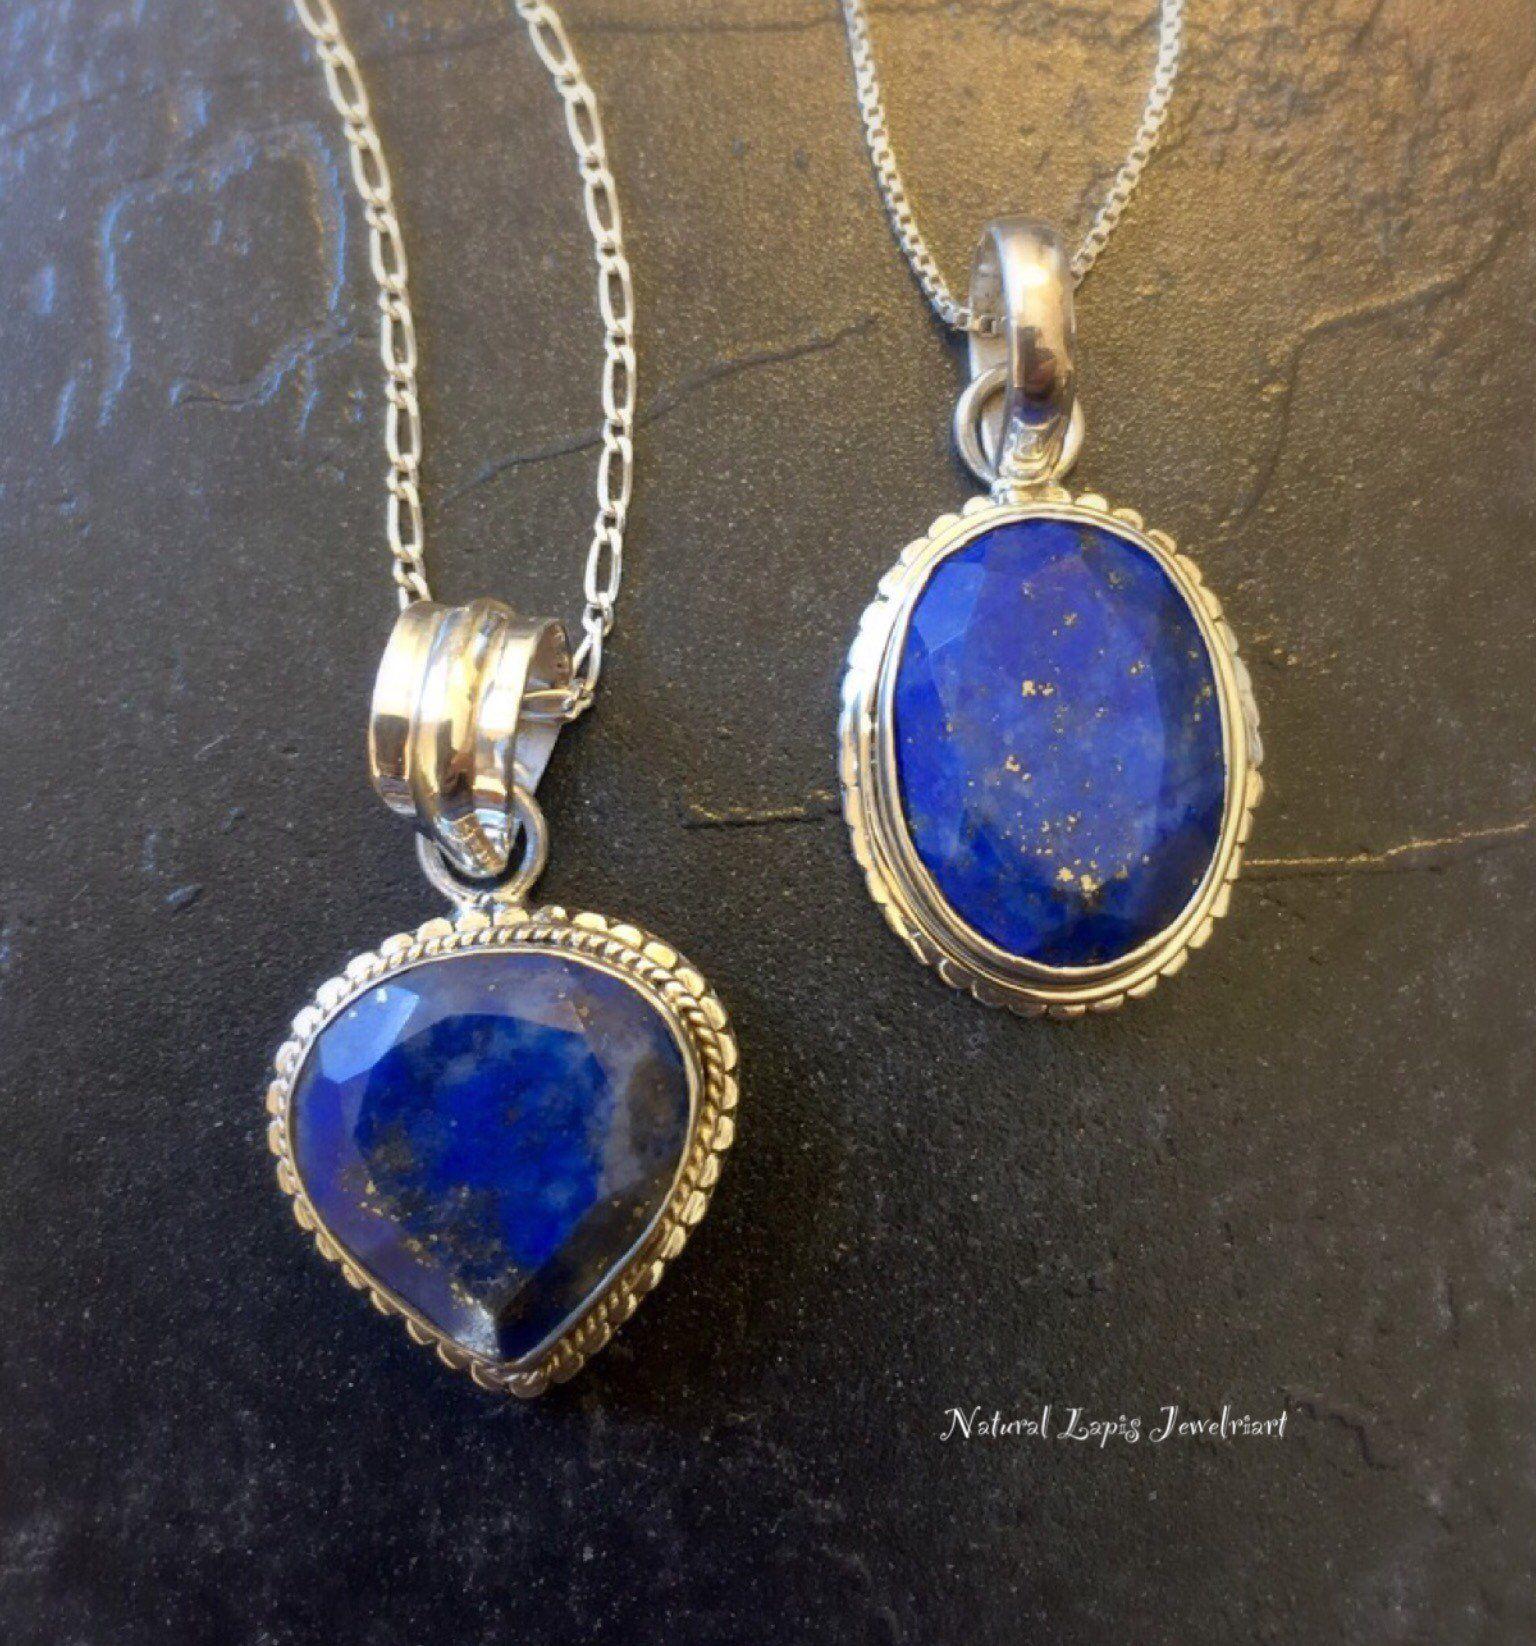 Lapis Lazuli Necklace Lapis Lazuli Pendant Unique Lapis Etsy In 2020 Lapis Pendant Solid Silver Necklace Lapis Lazuli Pendant